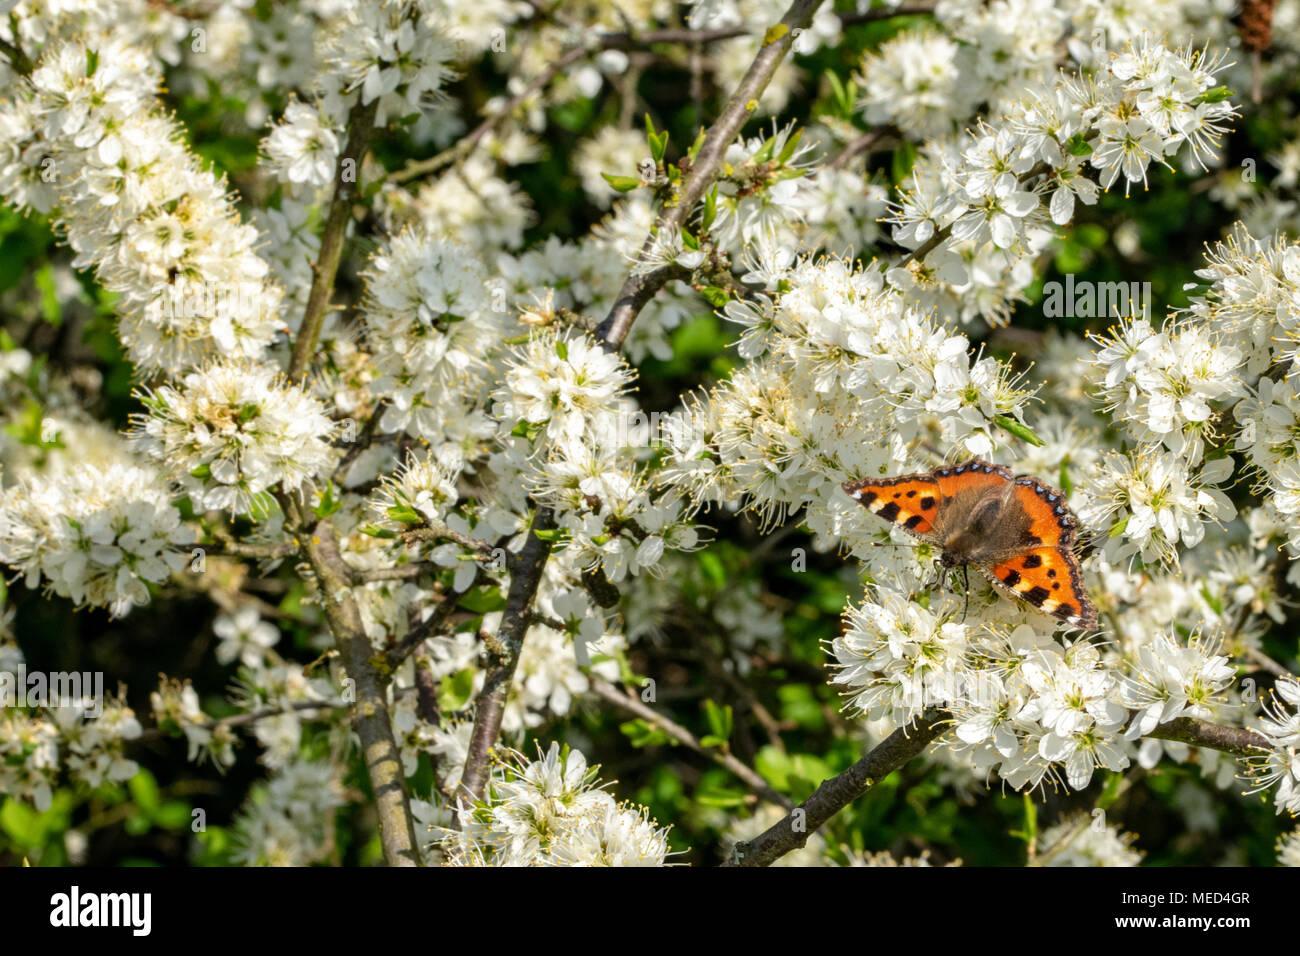 Small tortoiseshell butterfly (Aglais urticae) resting on white springtime blossom - Stock Image